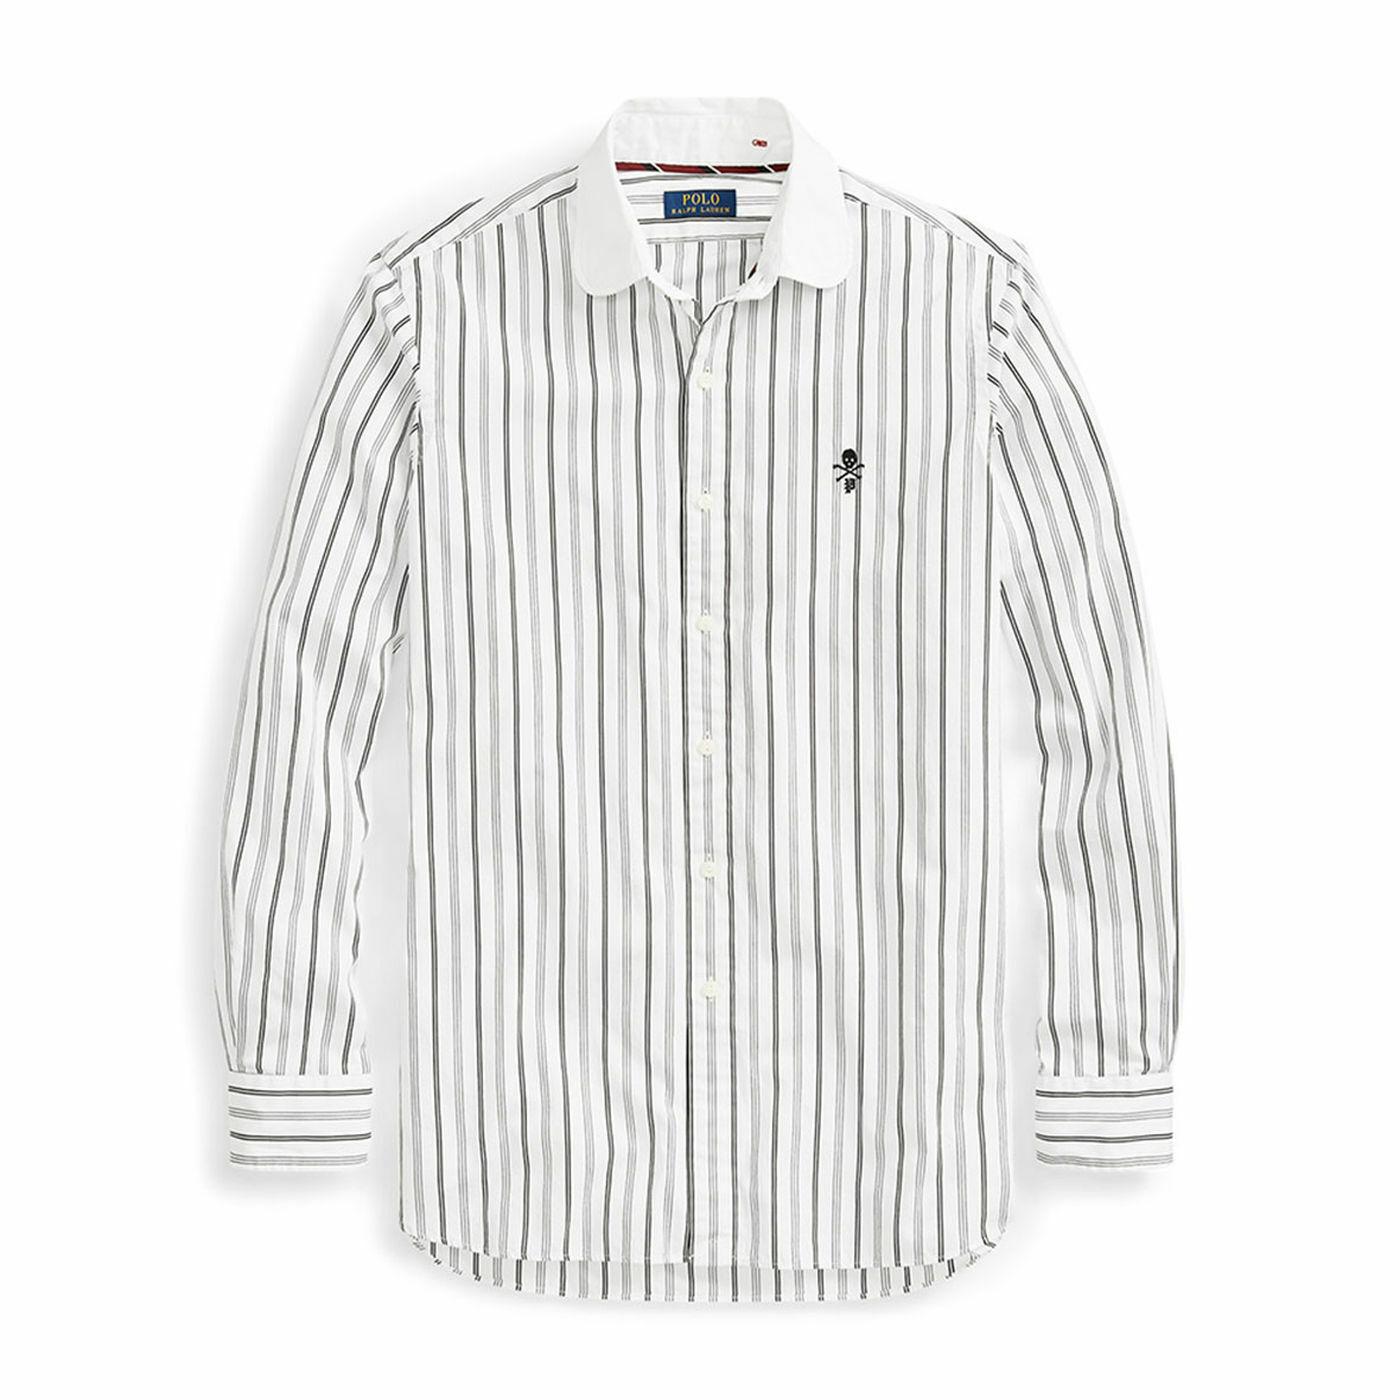 New Polo Ralph Lauren Classic Fit Striped Shirt S-XL gingham oxford plaid dress